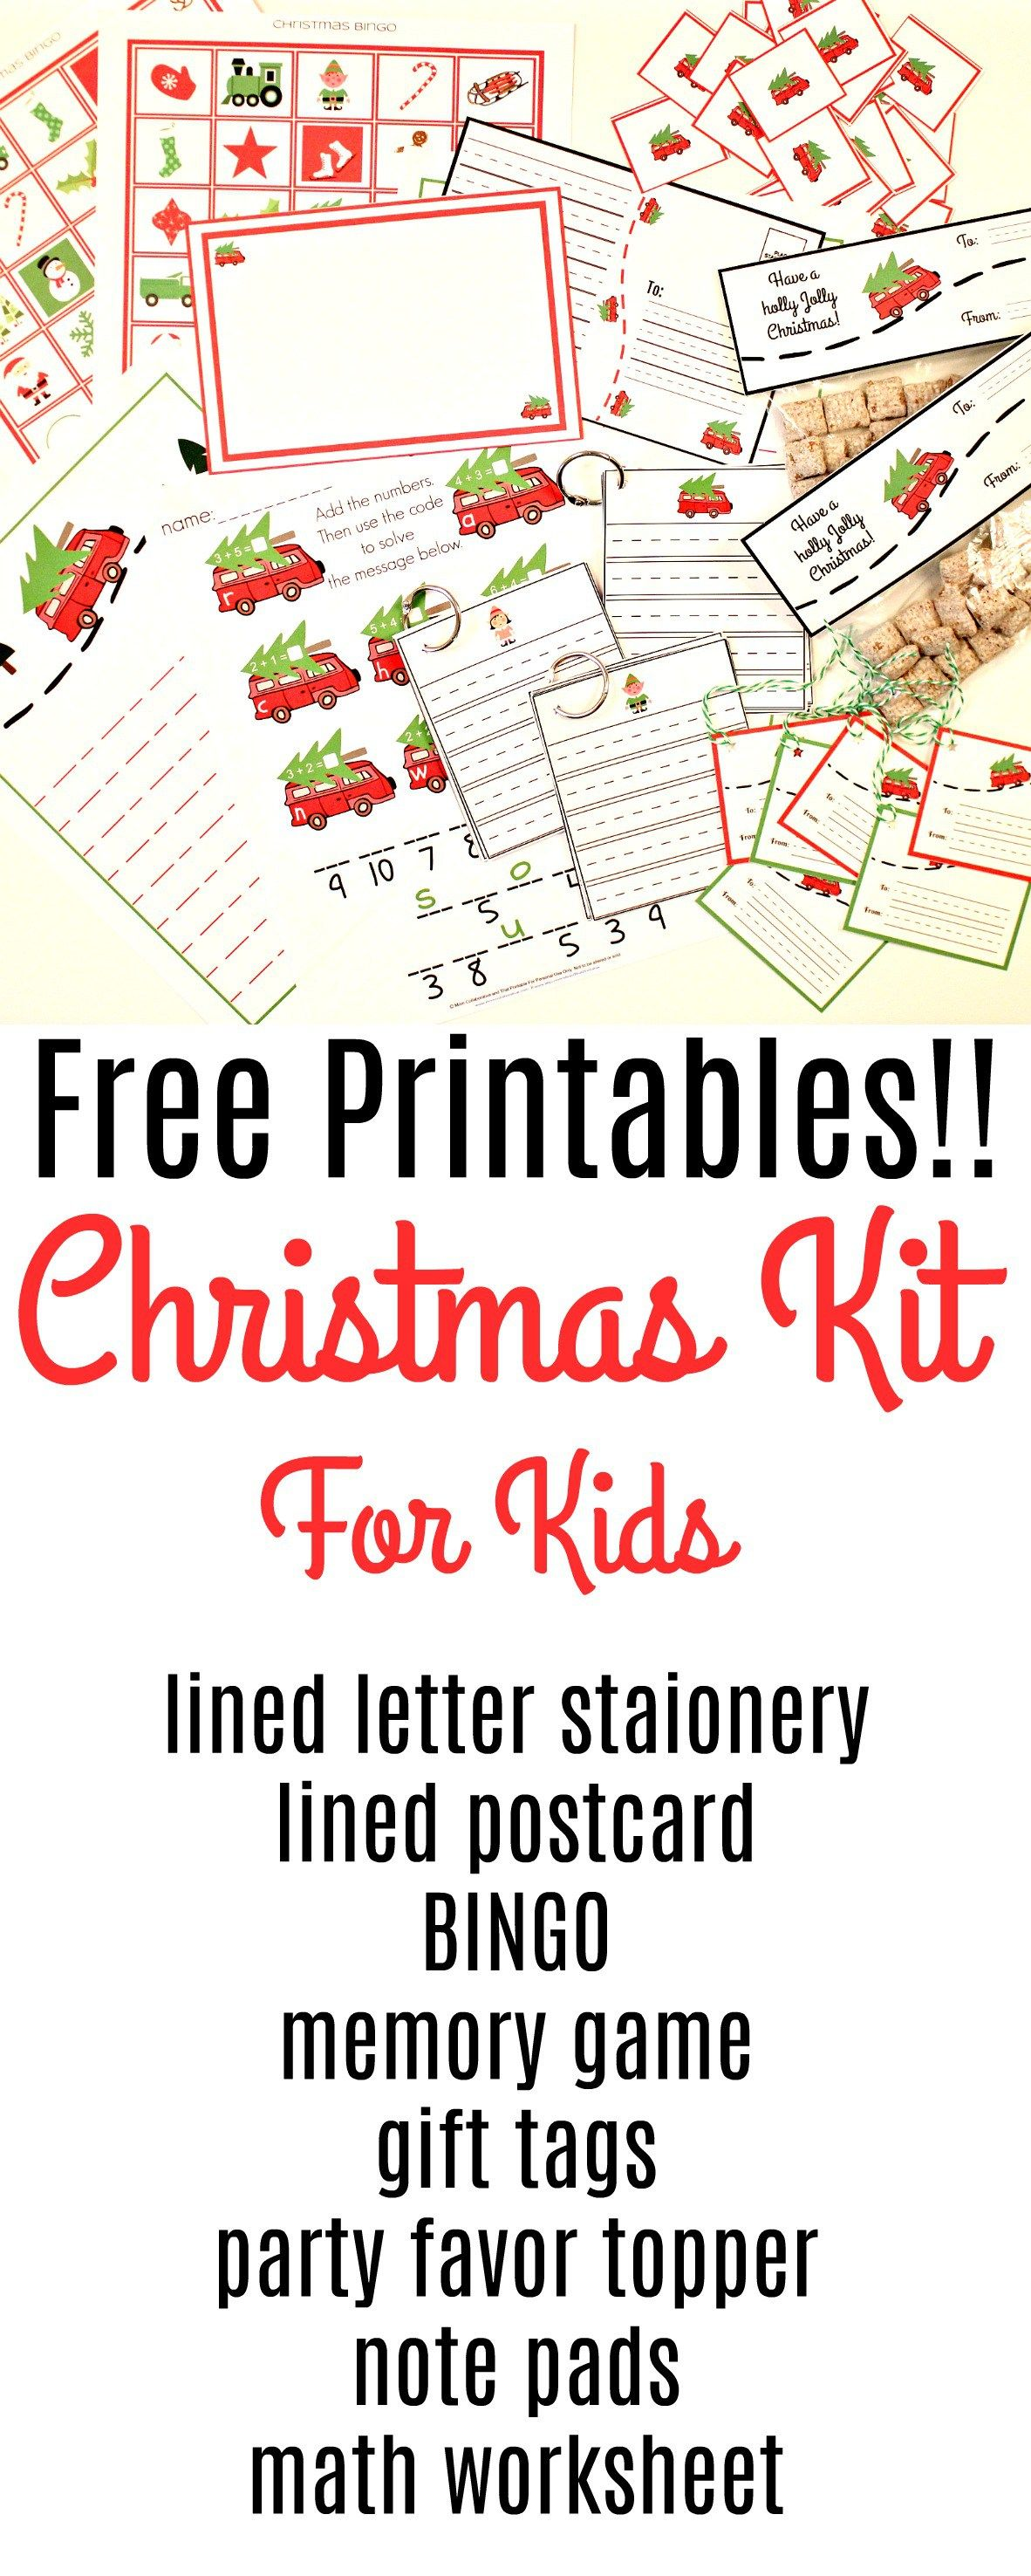 8 Pack Christmas Printables For Kids